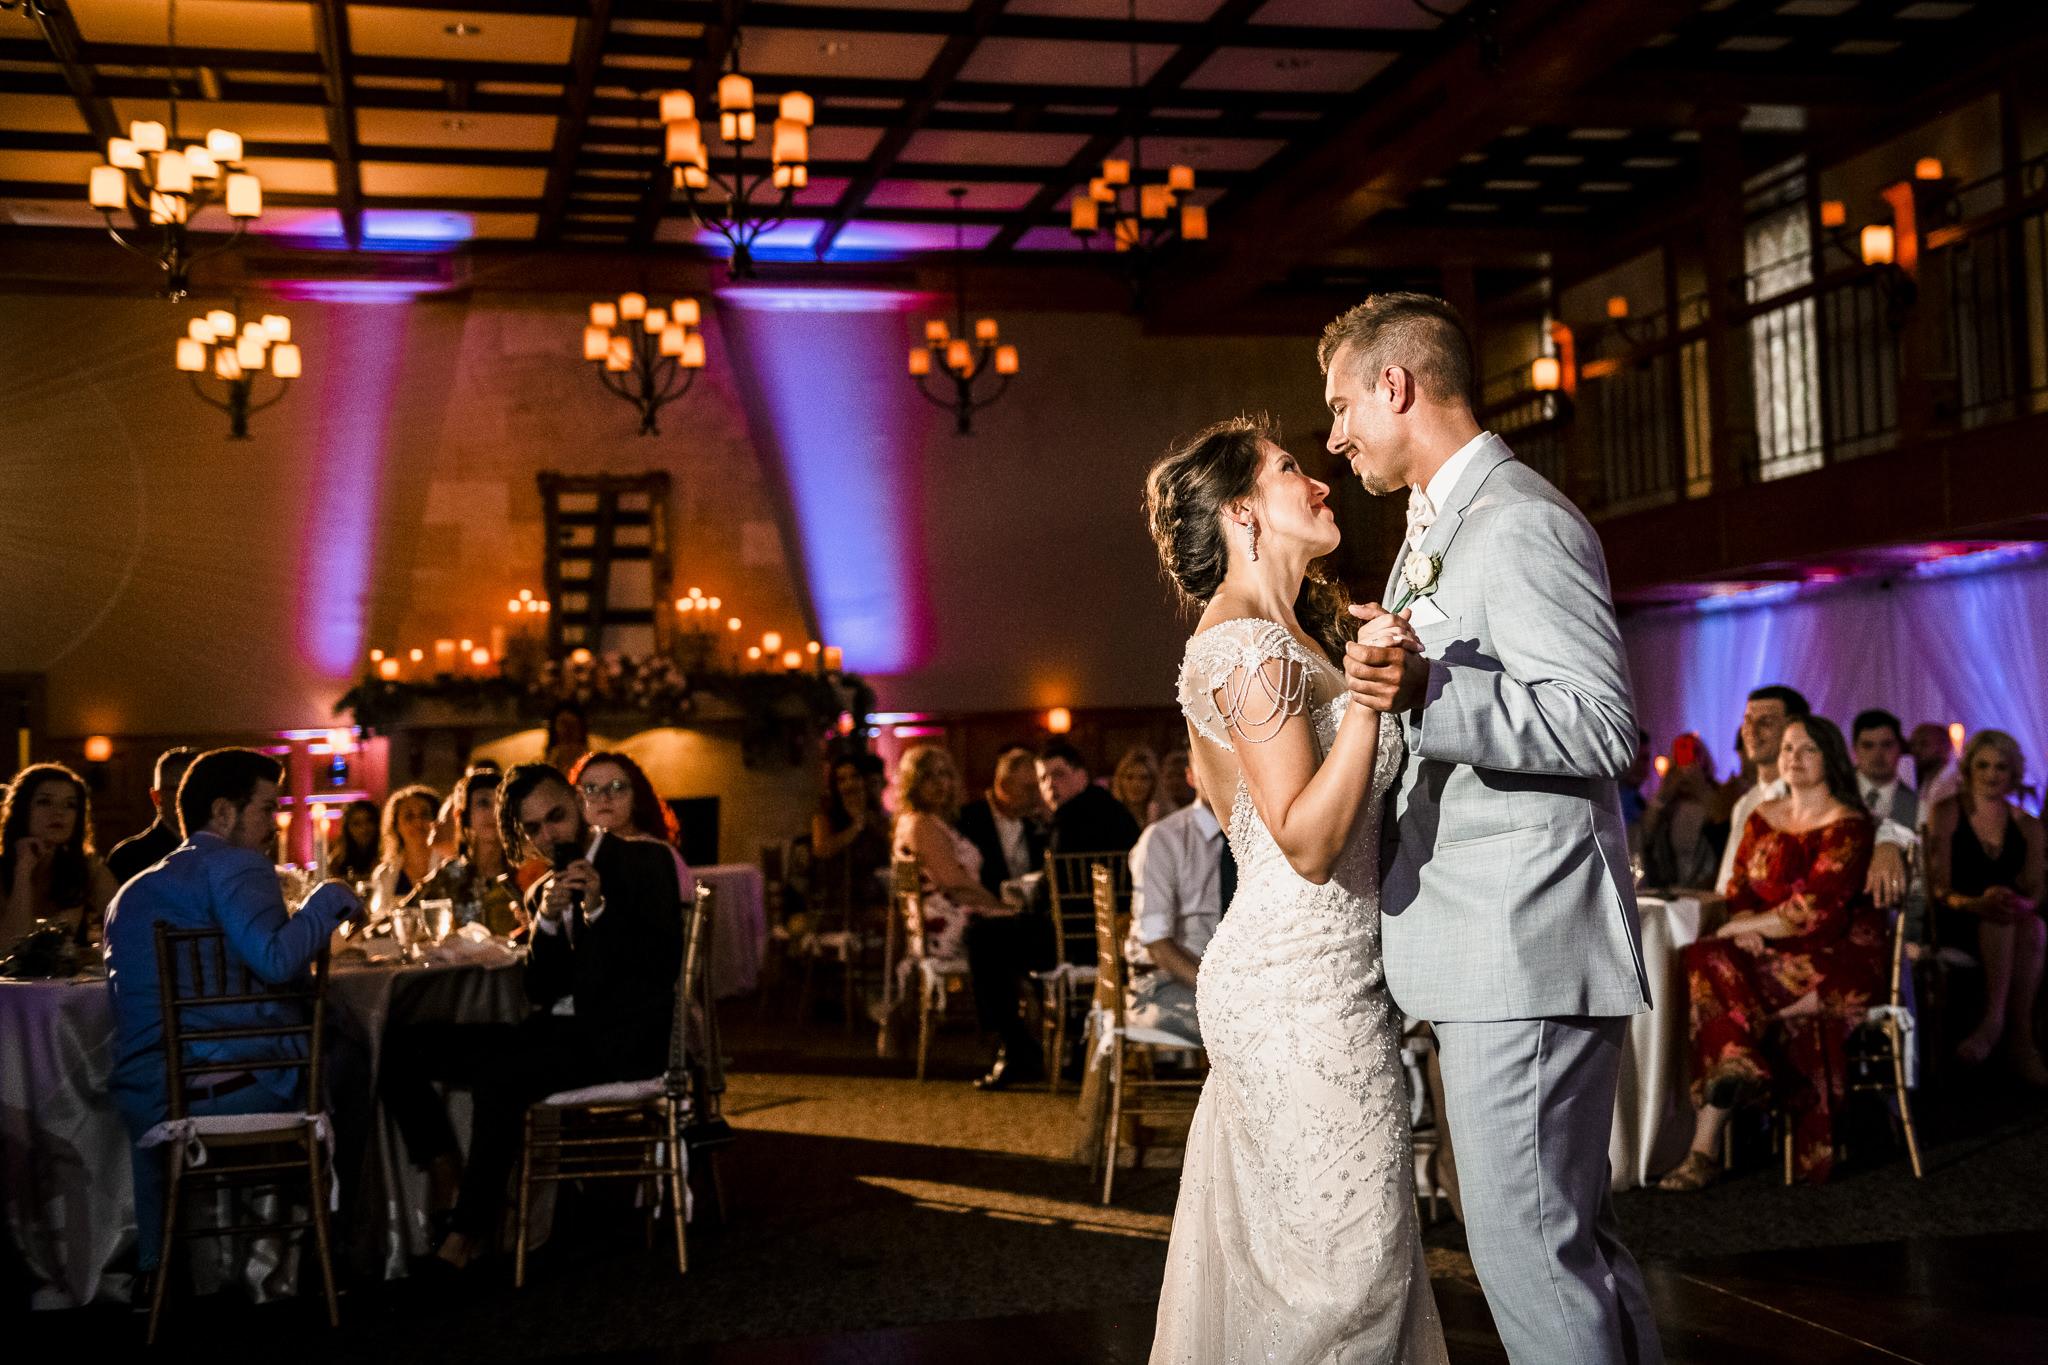 Barbato-Moorestown-Community-House-Wedding-New-Jersey-Photographer-28.JPG